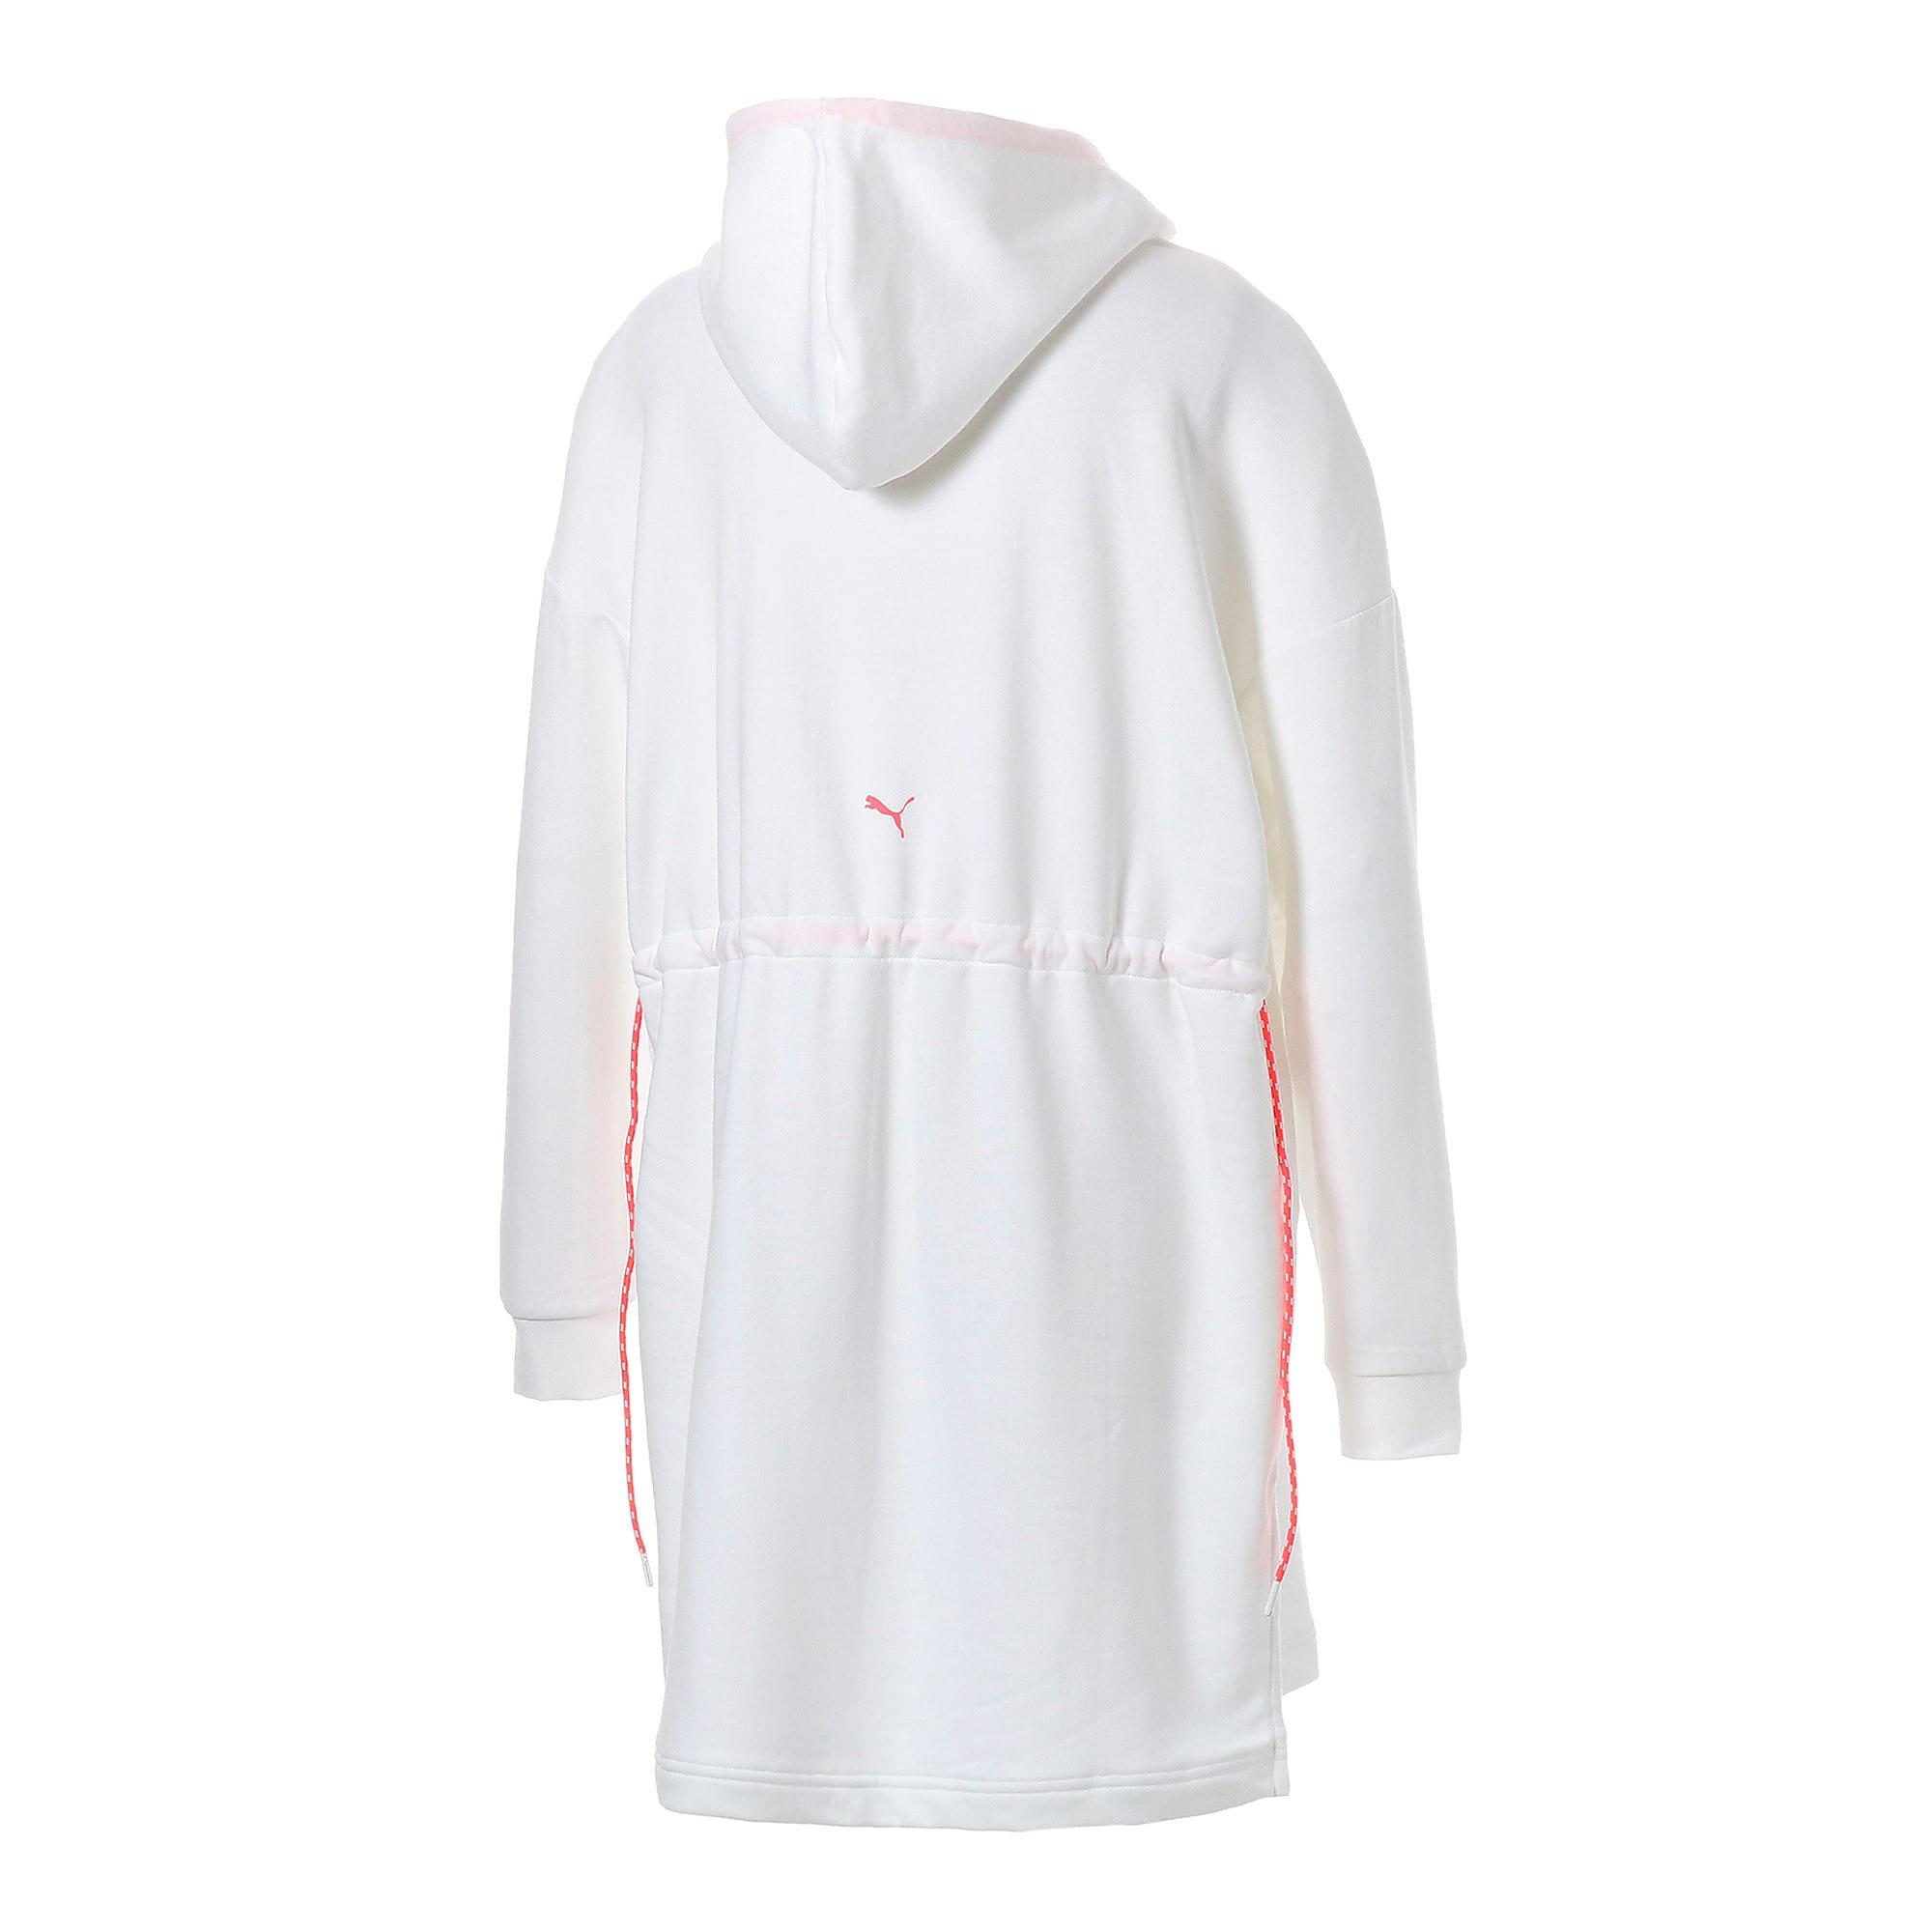 Thumbnail 12 of CHASE ウィメンズ フーデッドドレス, Puma White, medium-JPN